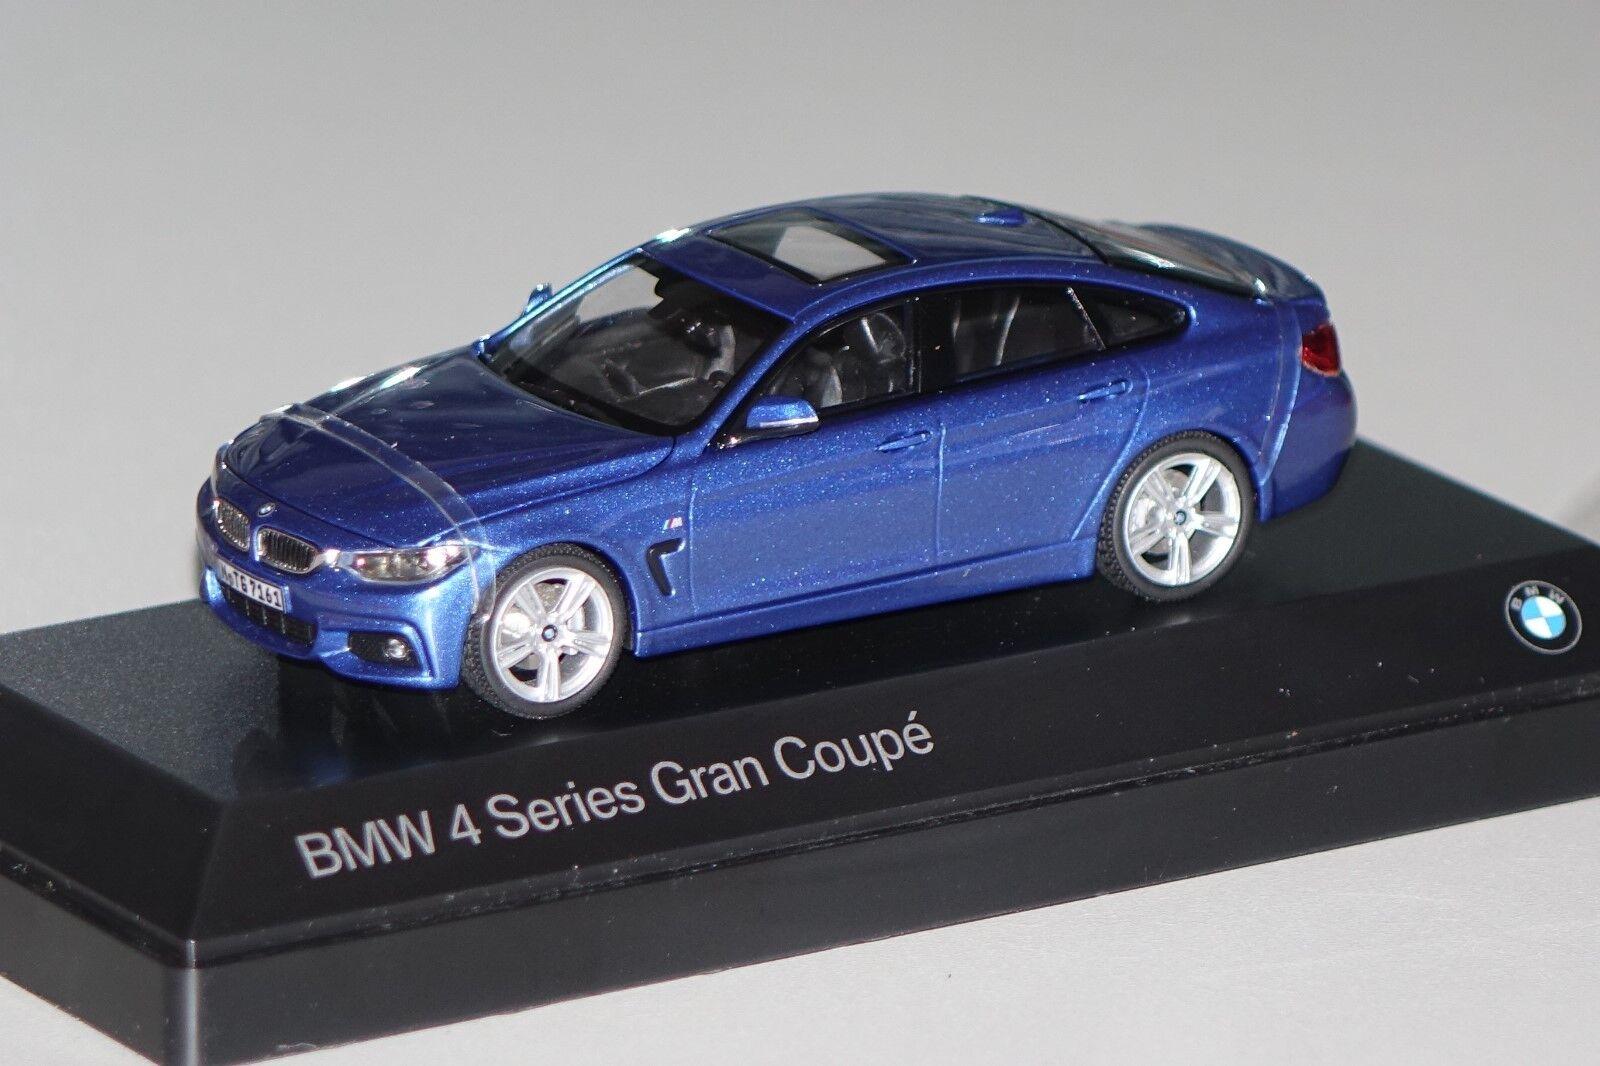 Bmw 4er gran coupé blau traf.1 43 bmw neu + ovp 80422348792